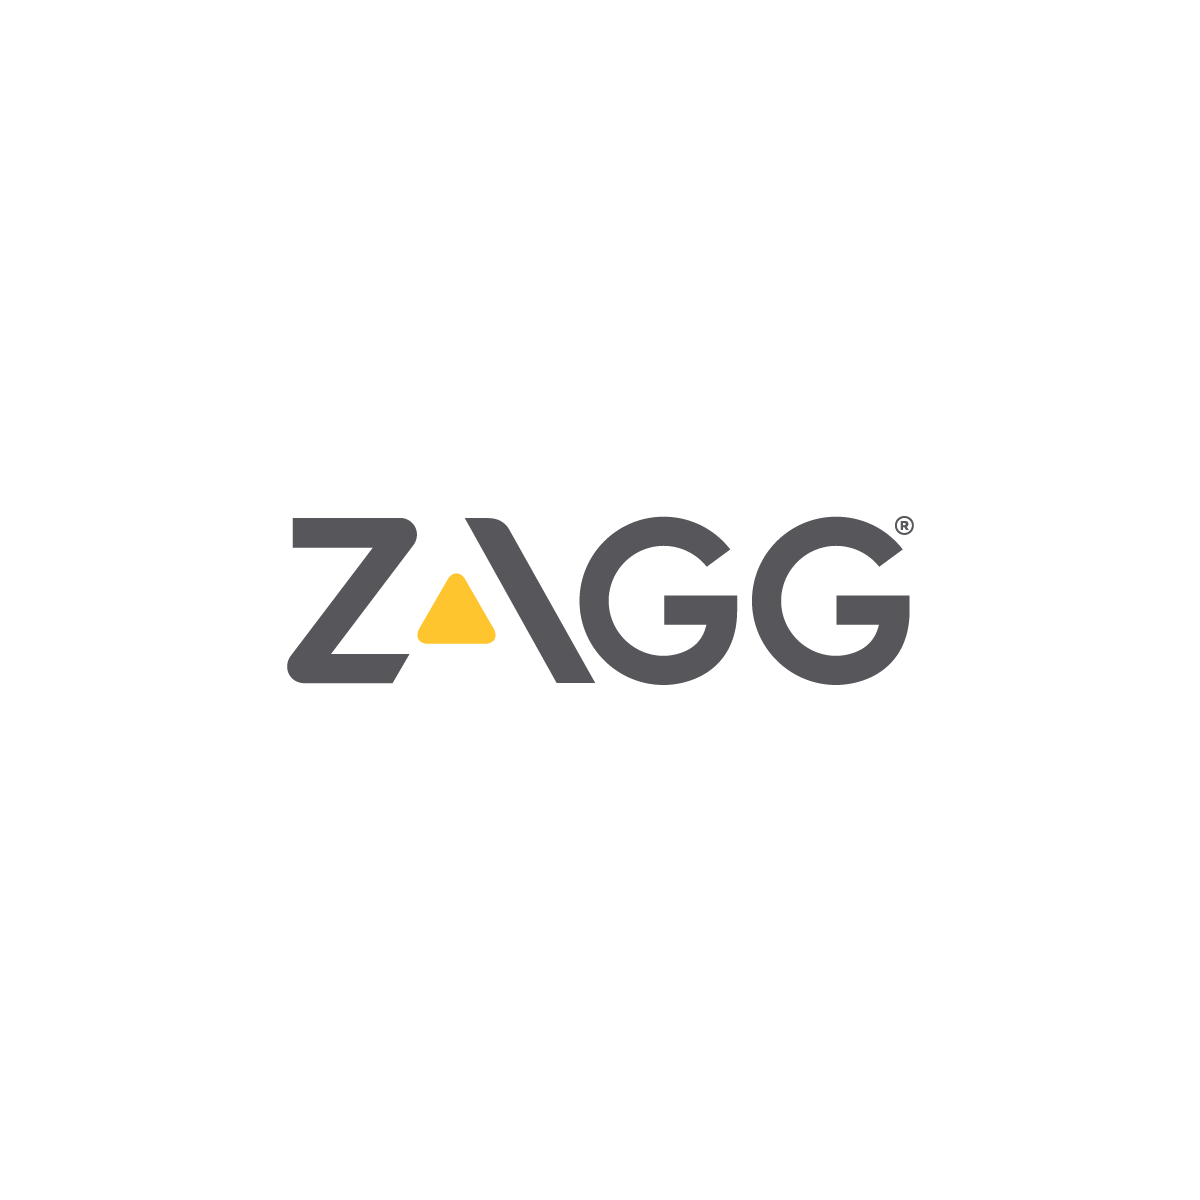 ZAGG Inc